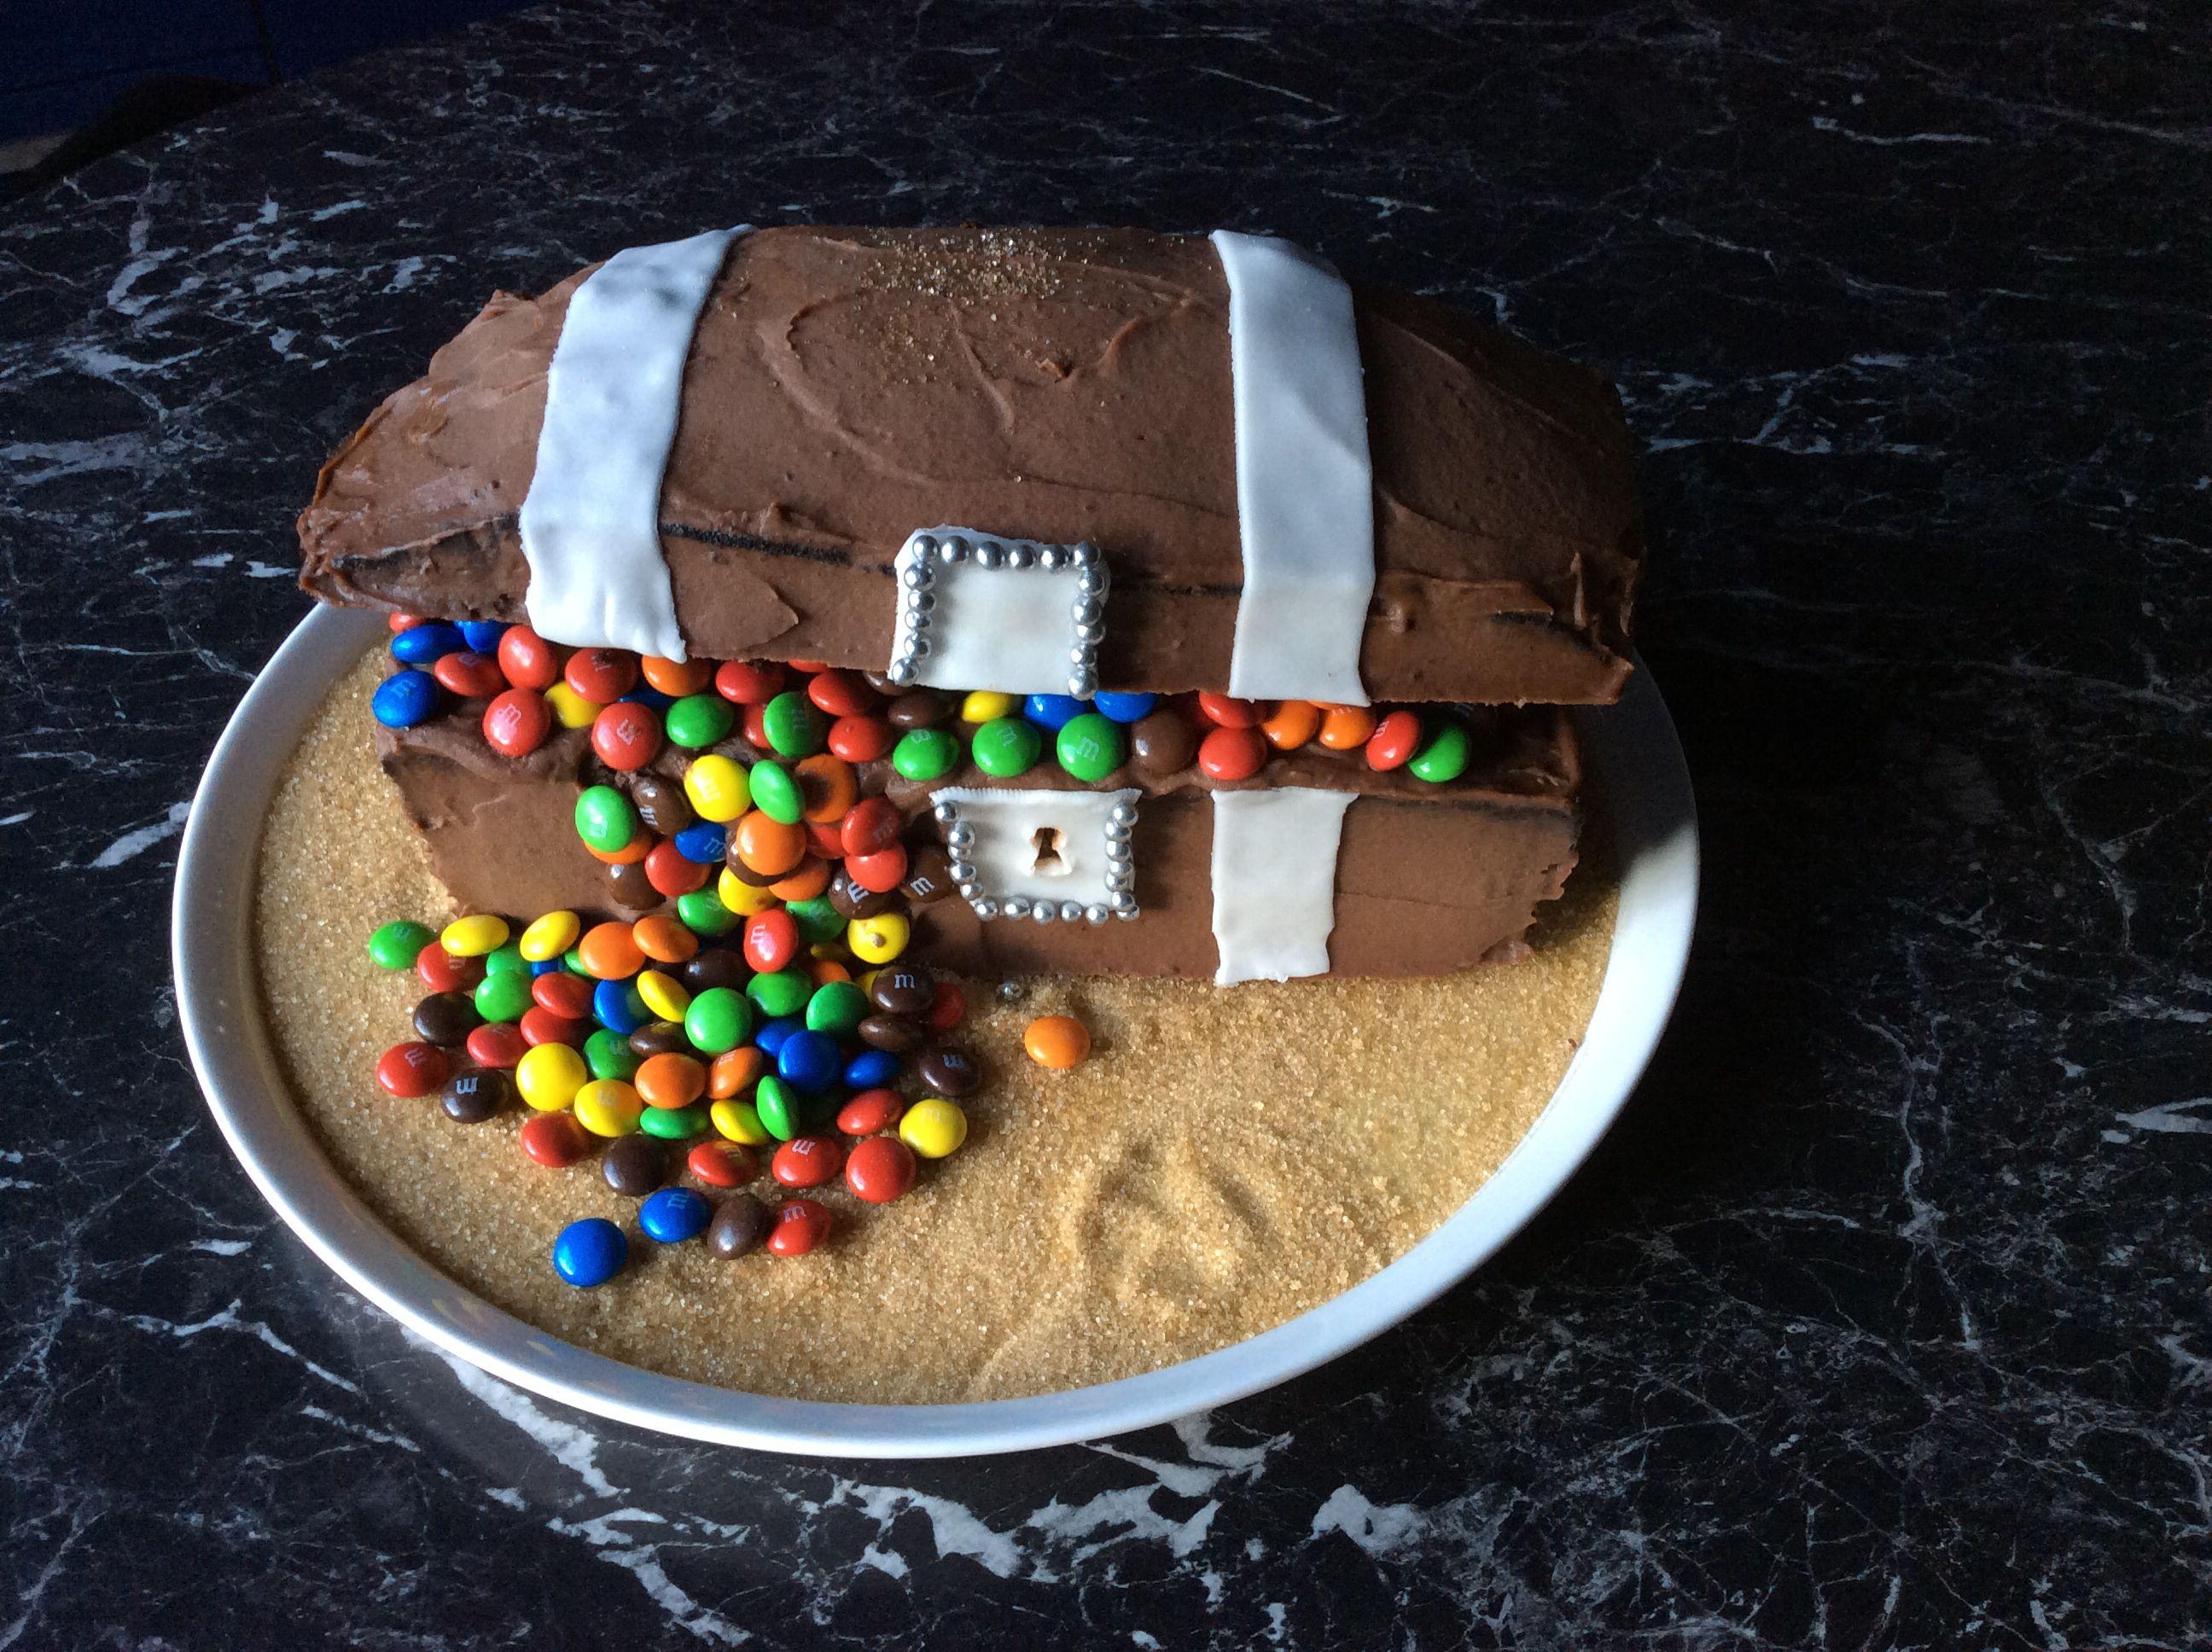 pirate Cake with treasure Piraten Schatzkisten Kuchen ...